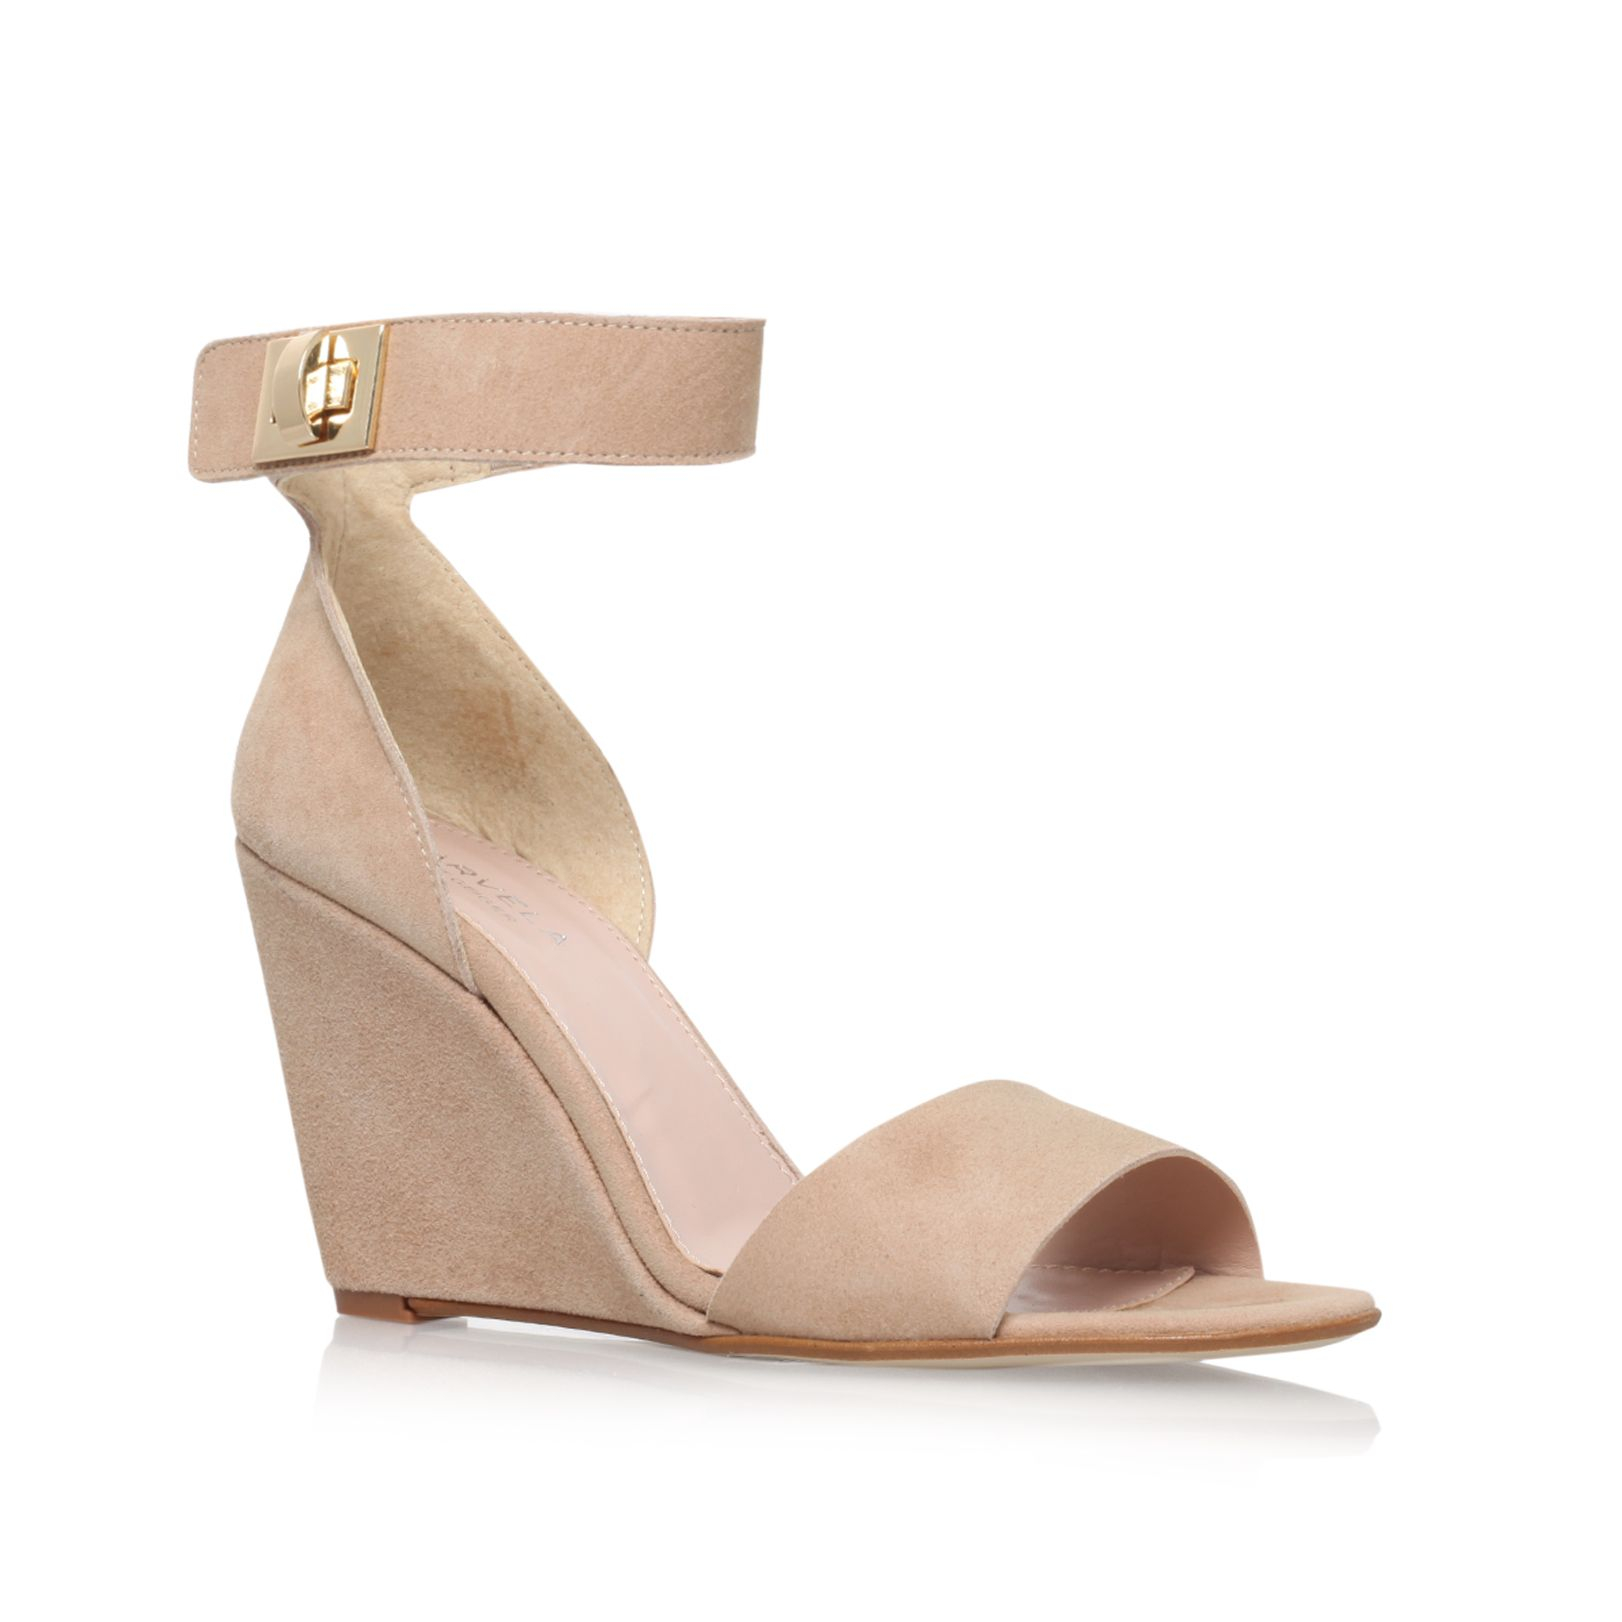 carvela kurt geiger kulprit high heel wedge sandals in